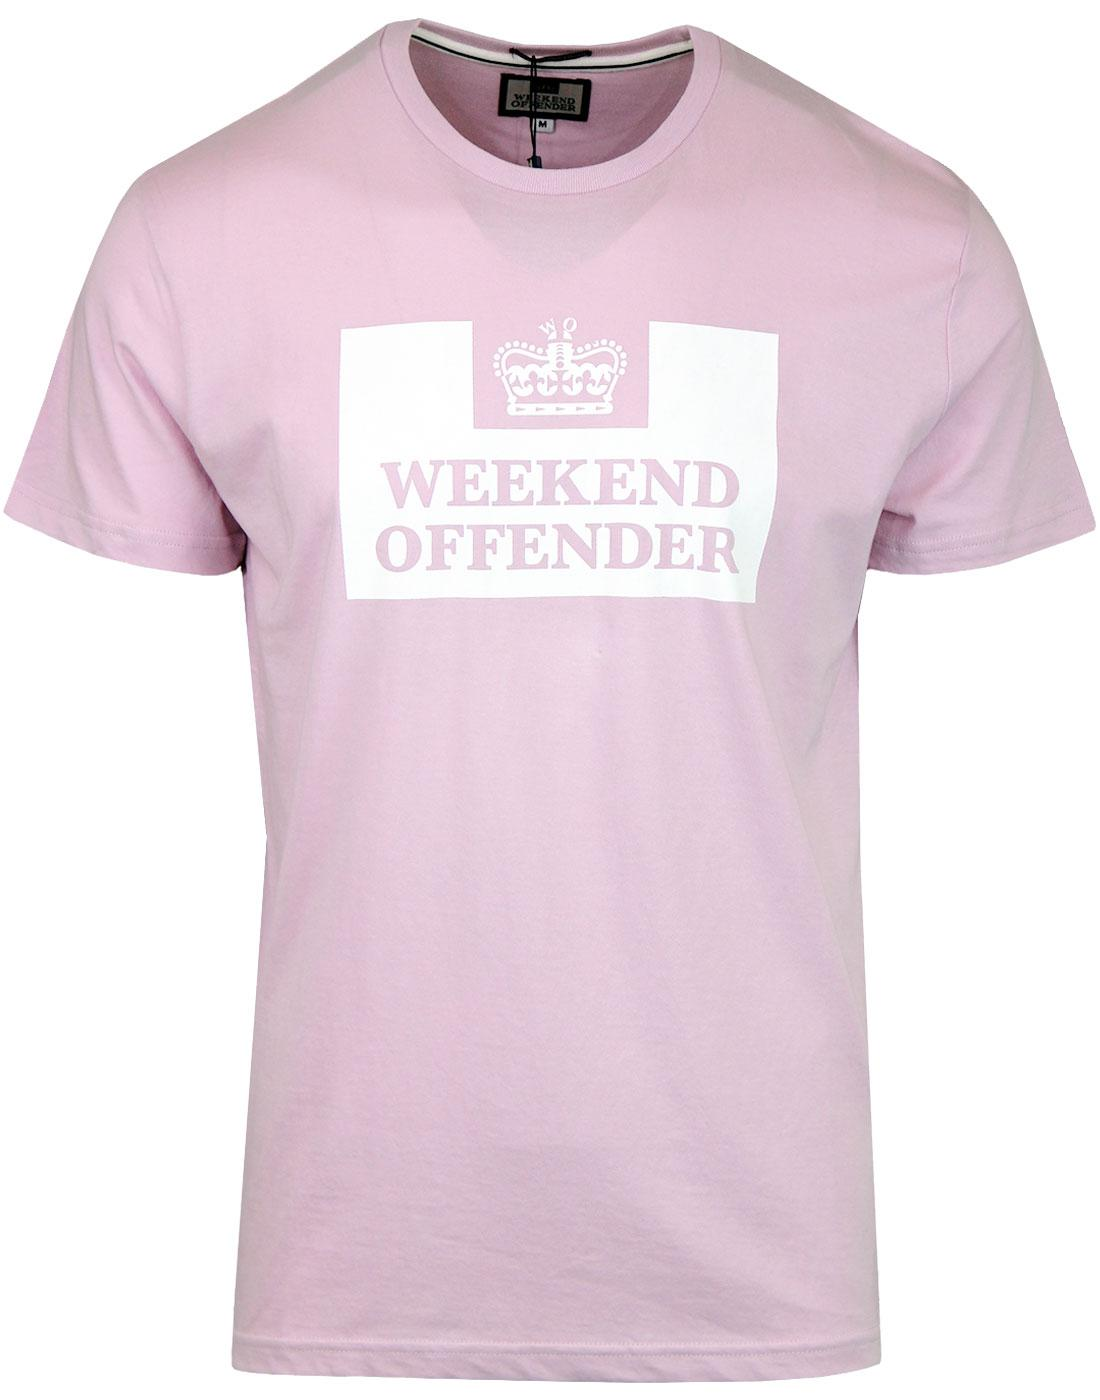 WEEKEND OFFENDER Retro Casuals Prison T-shirt (P)